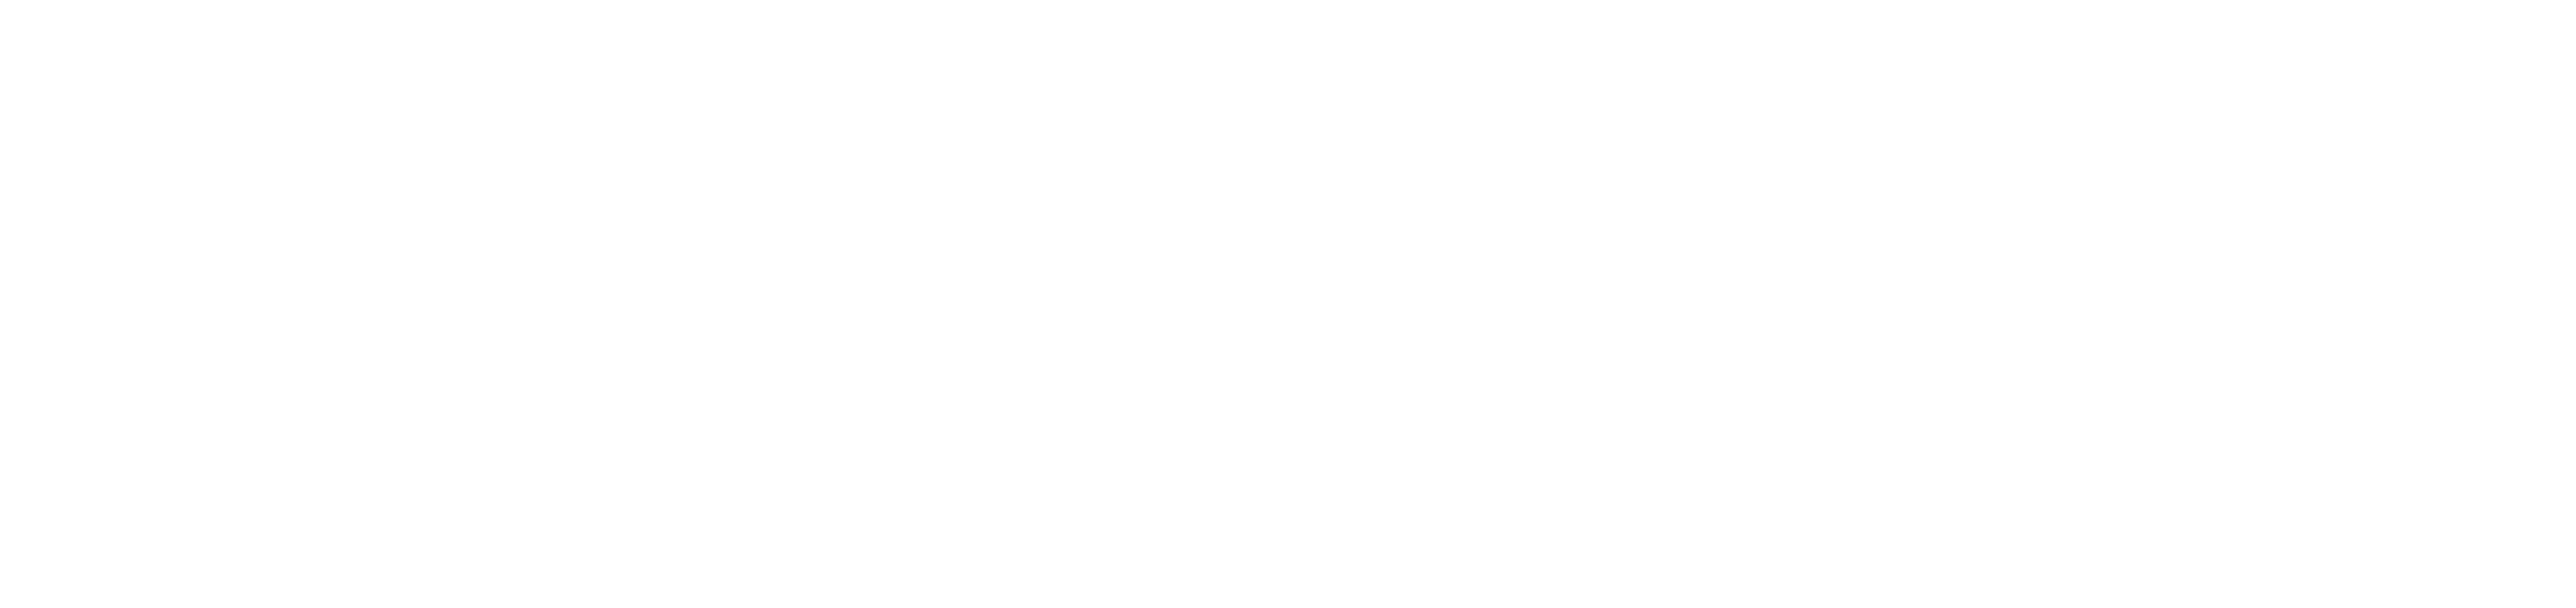 OVERDØSE THE LABEL